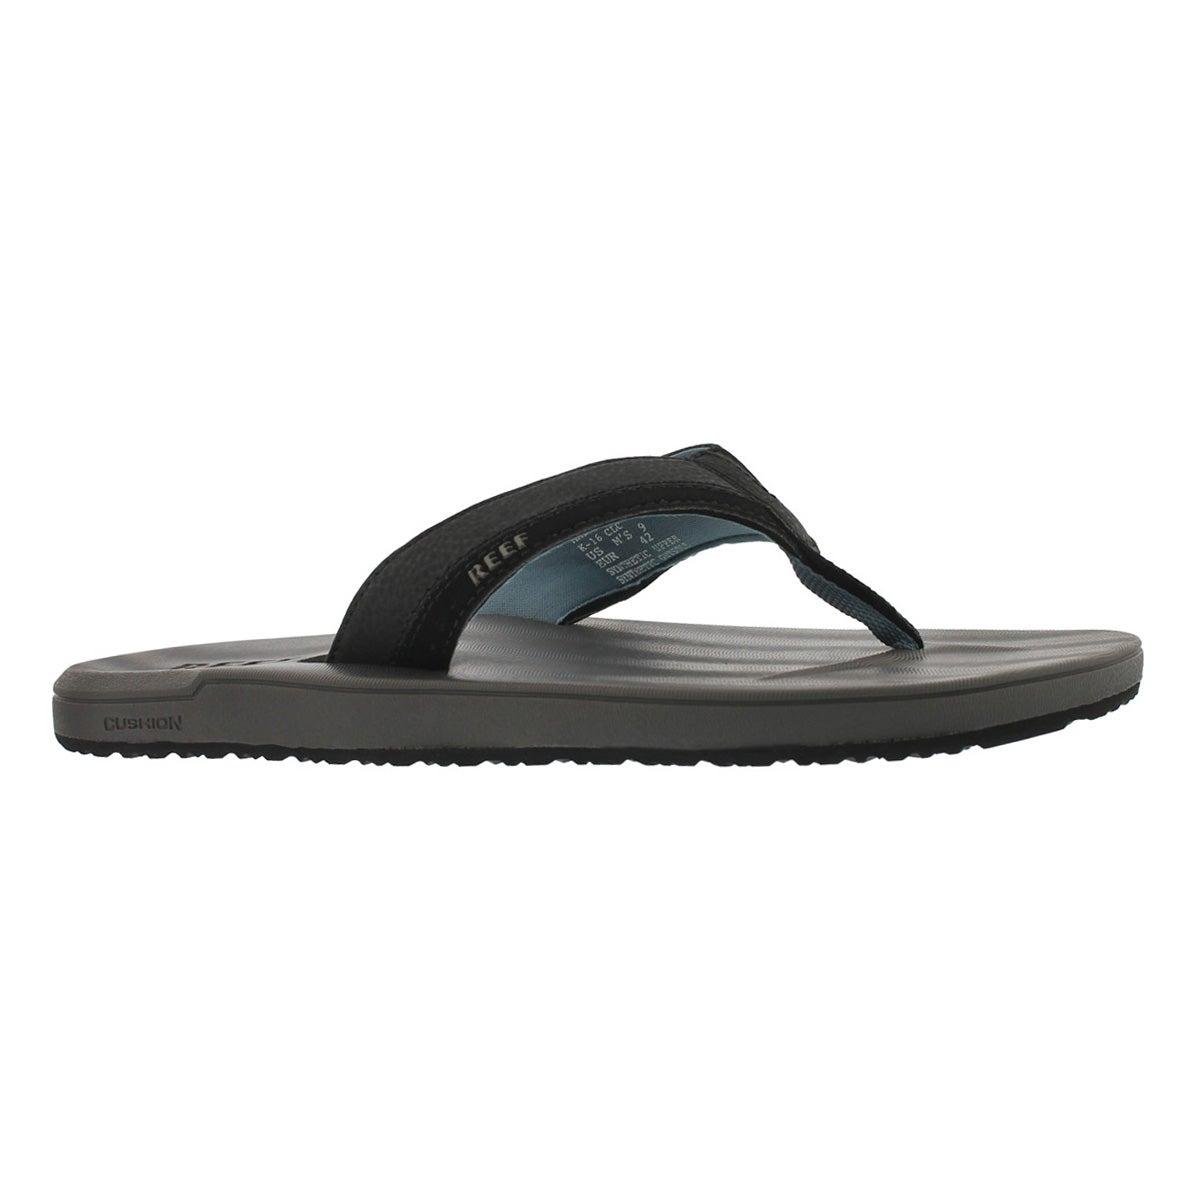 Men's COUTOURED CUSHION grey/blue thong sandal